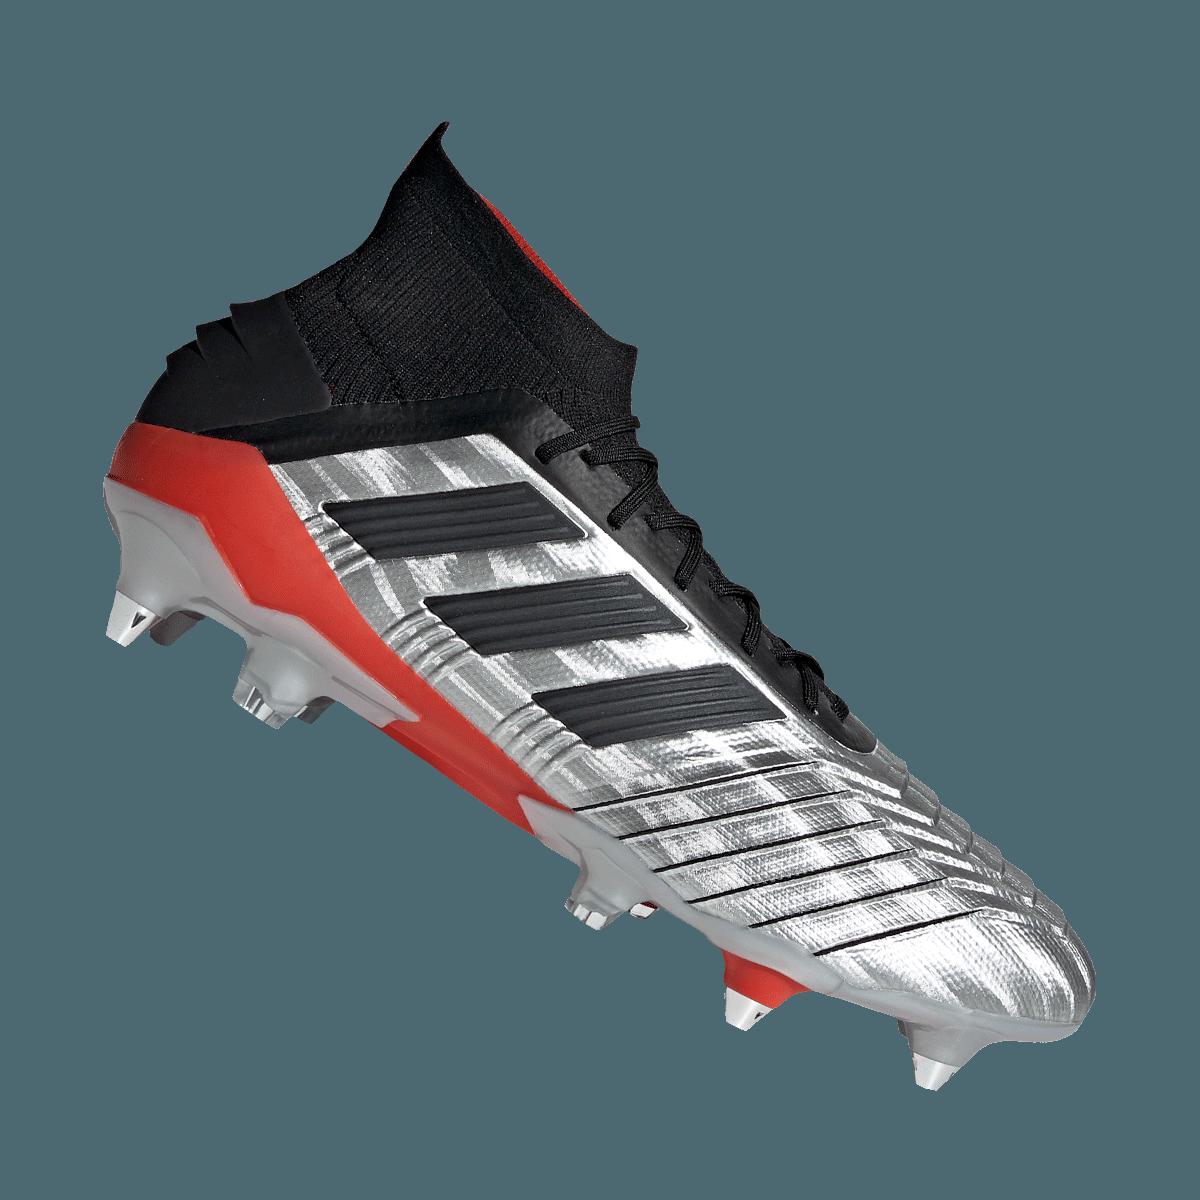 adidas voetbalschoenen Predator SG zilverzwart